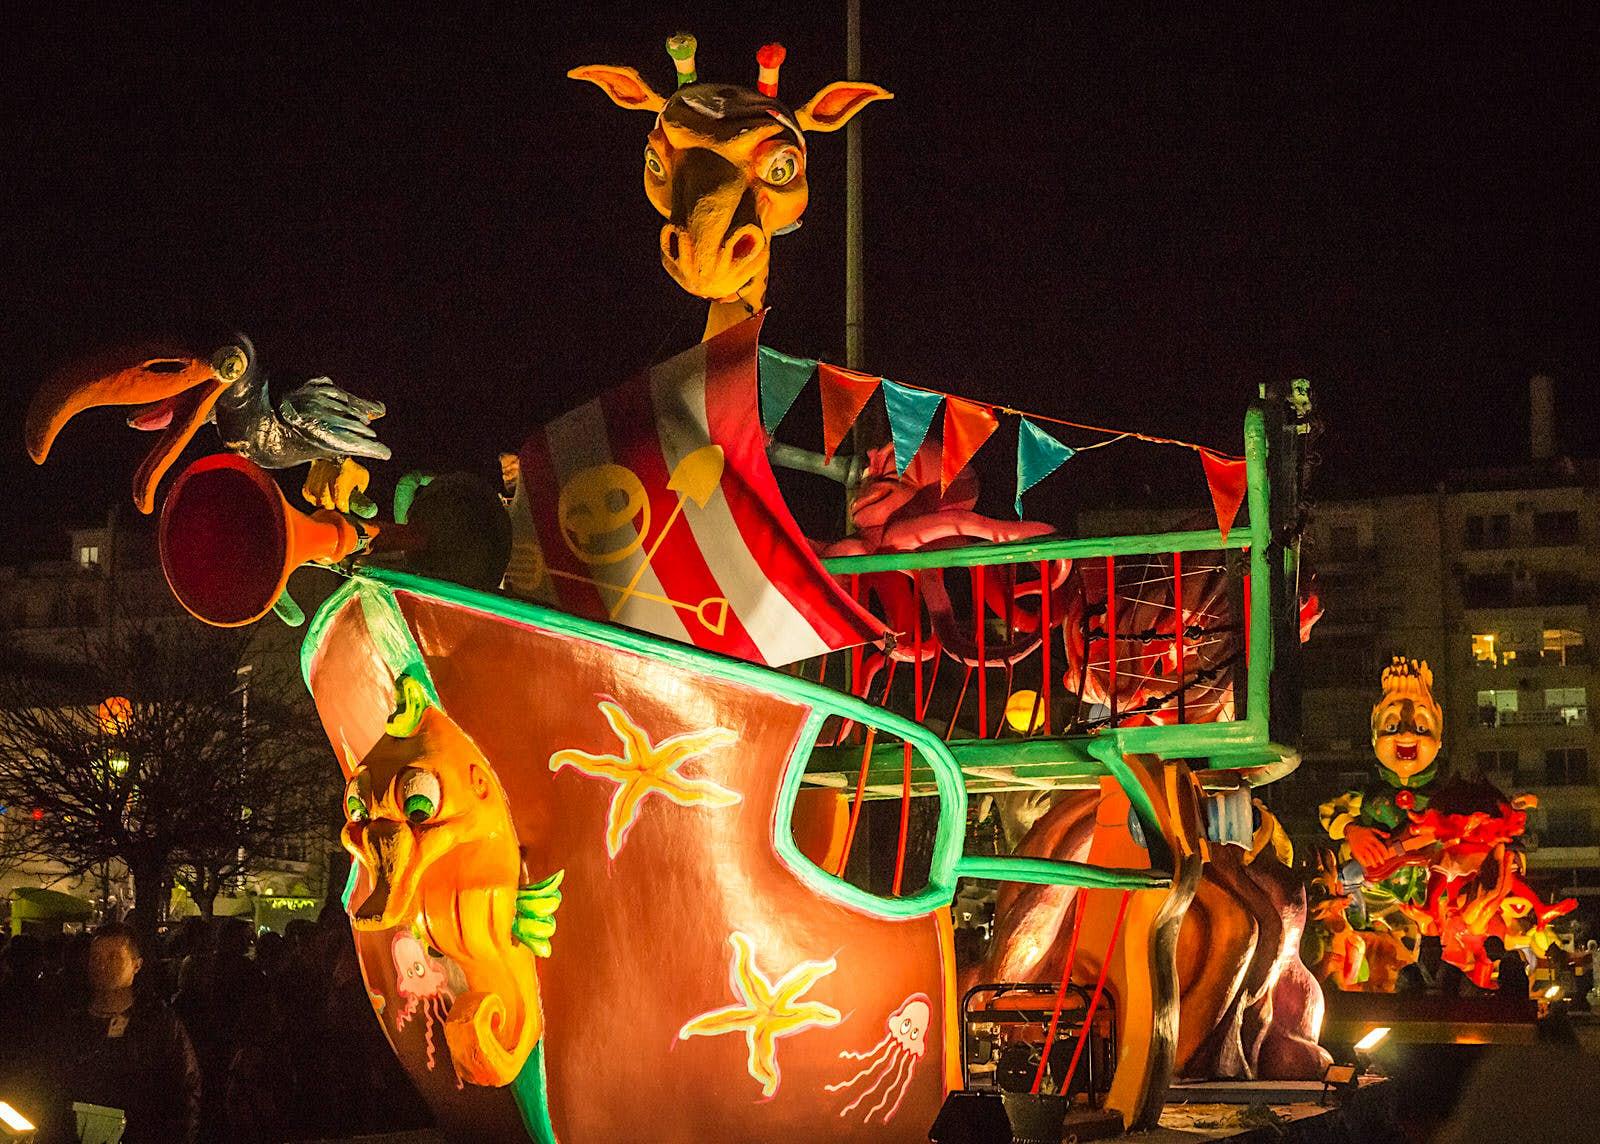 The night parade at the Patras Carnival © siete_vidas / Shutterstock